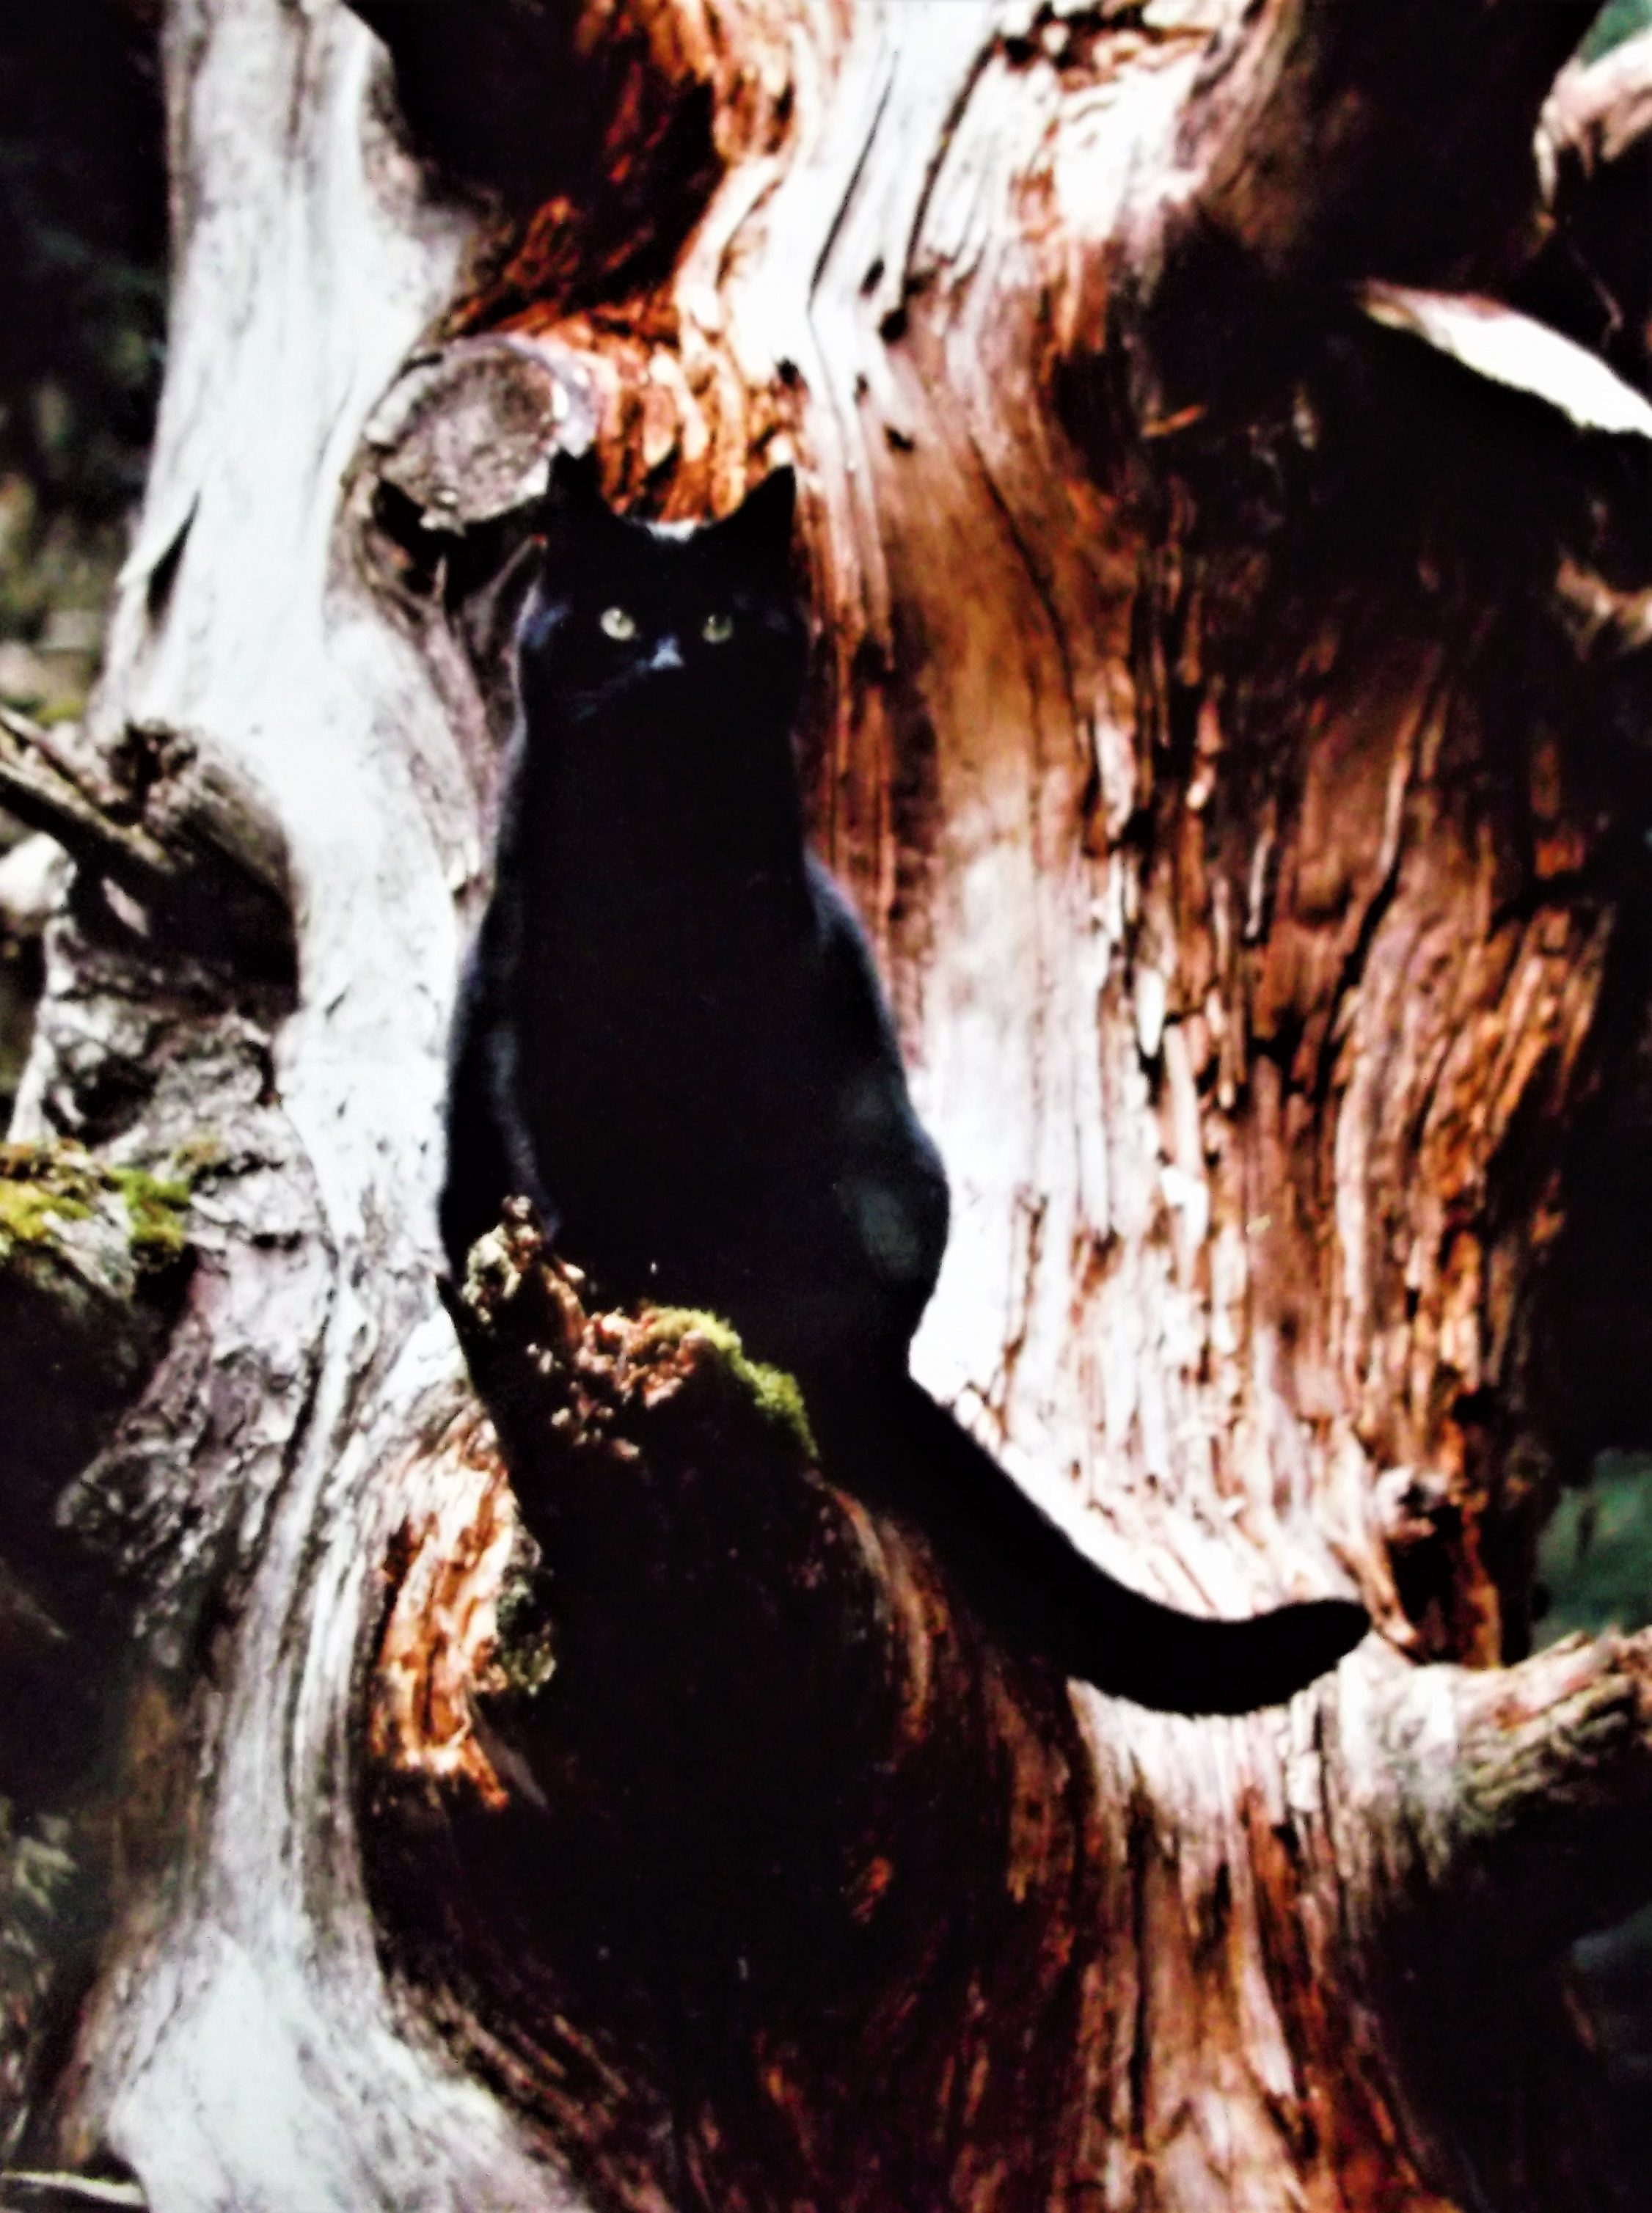 black cat sitting on standing dead limb